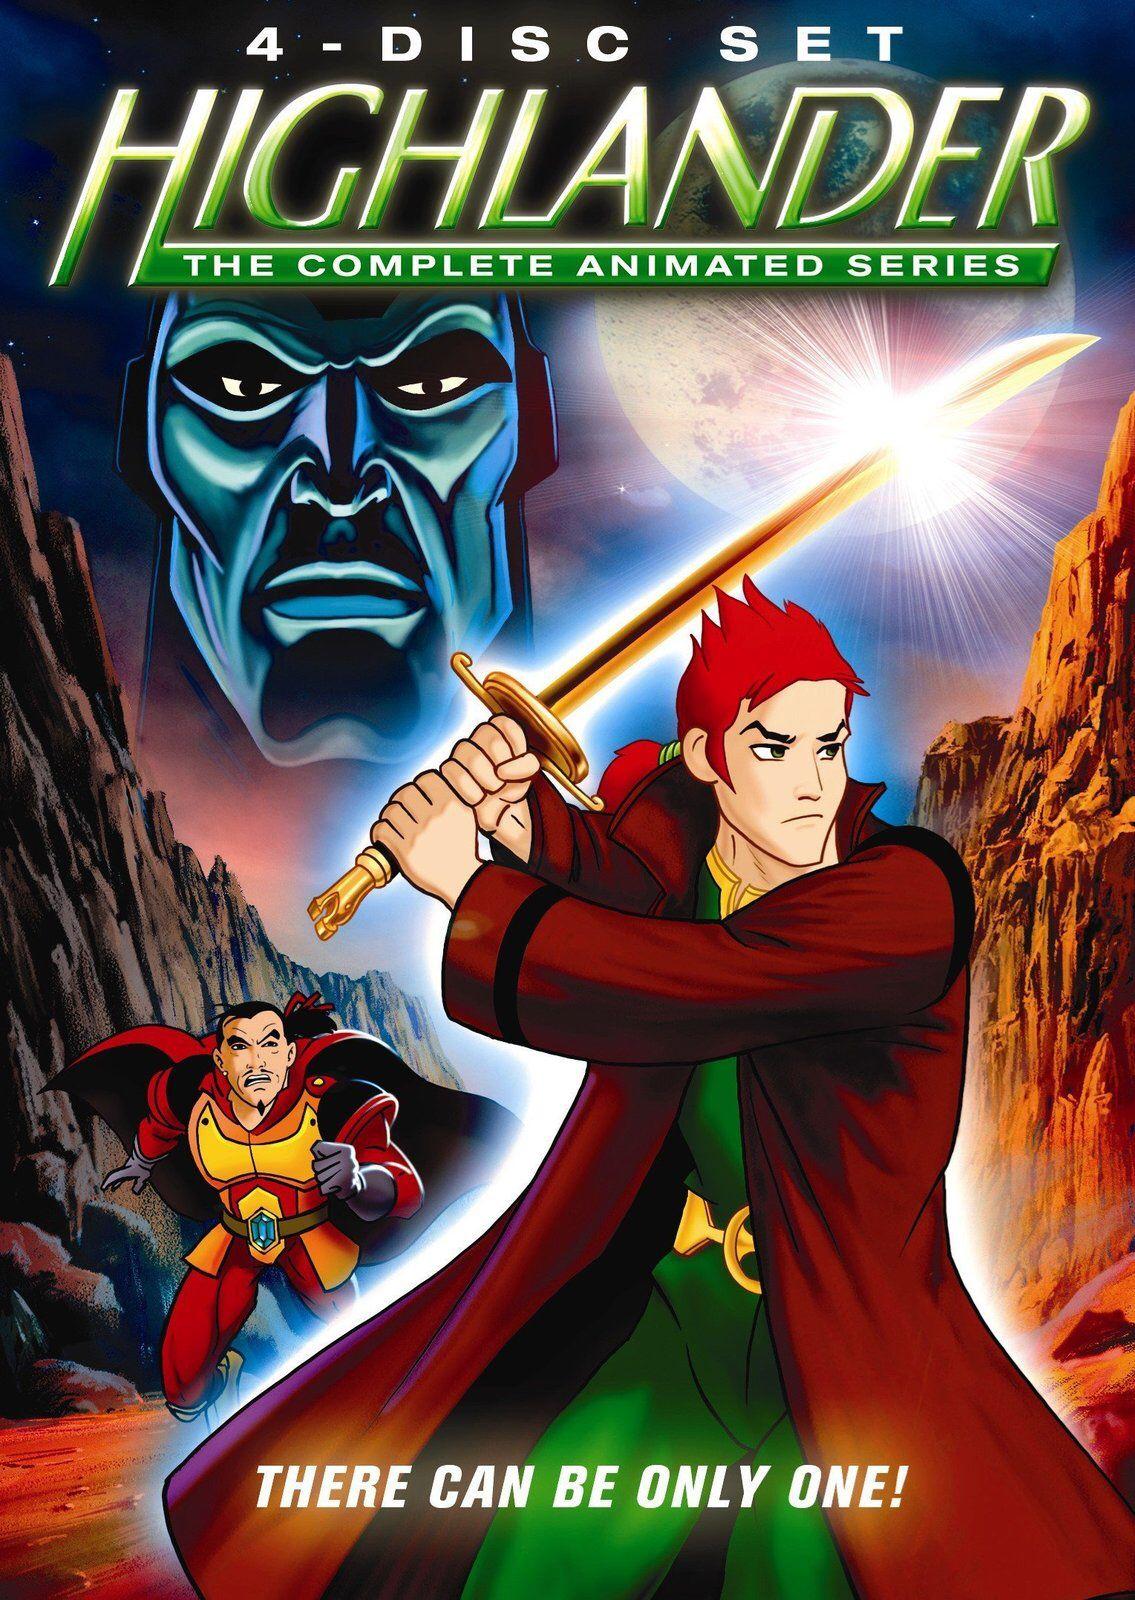 1990s animated series highlander. Animation series